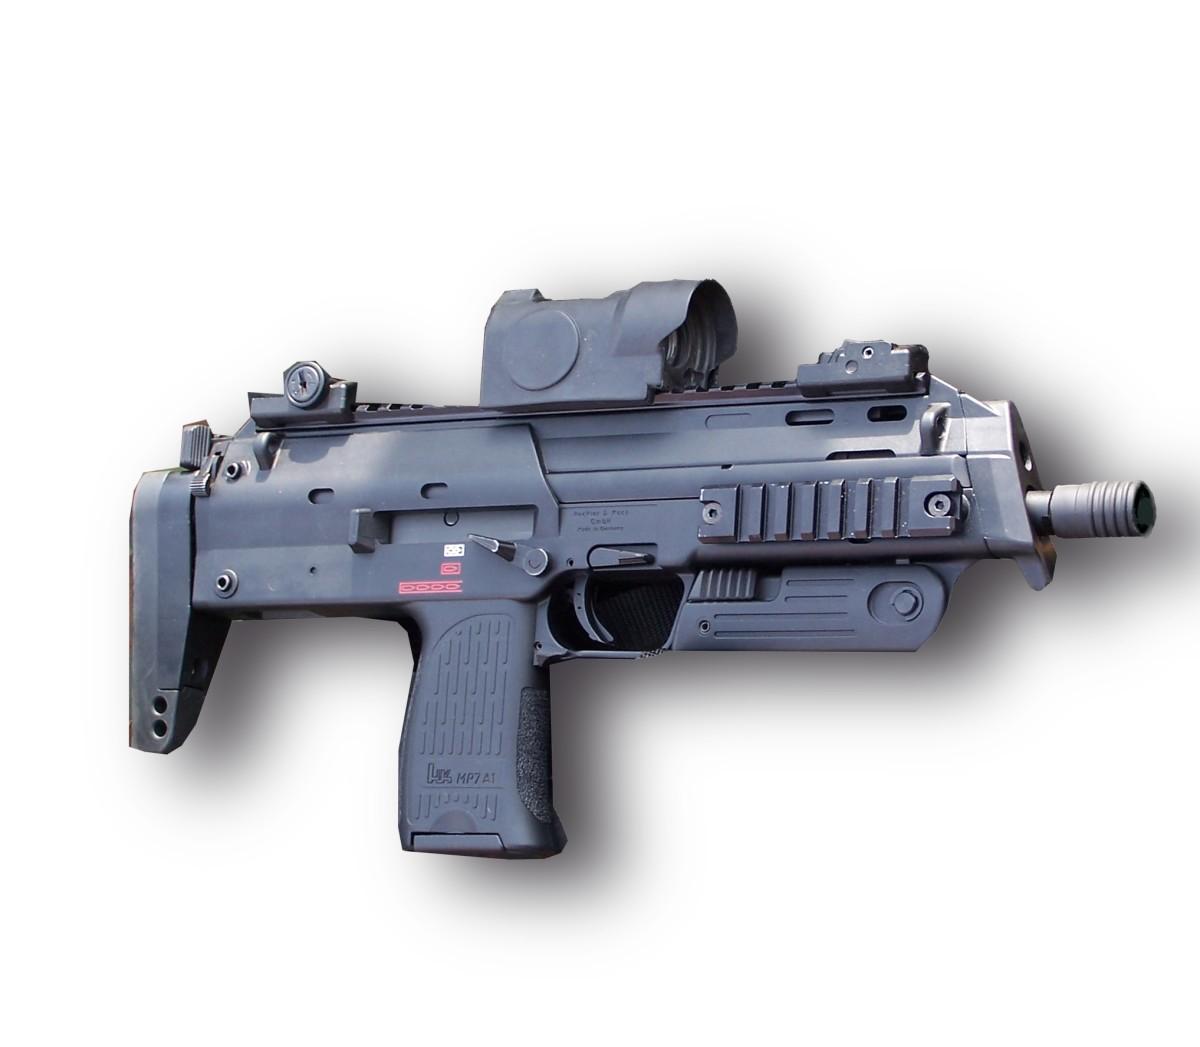 Best sub-machine gun for the ladies